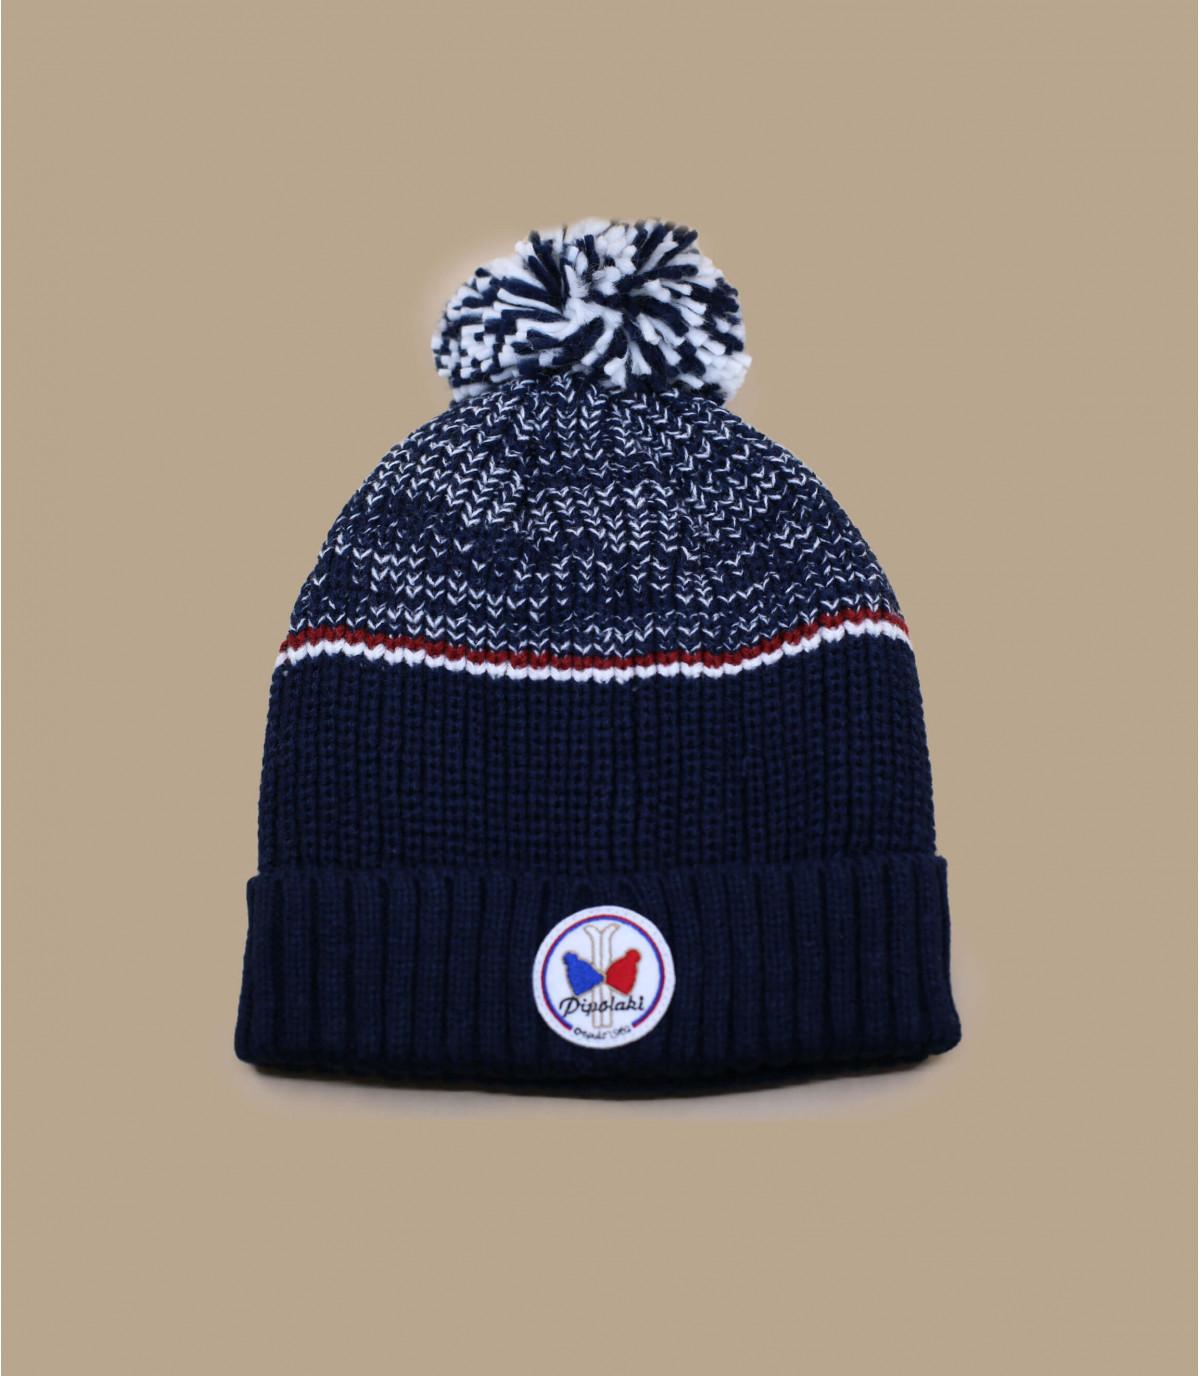 Mütze marineblau Pipolaki Bommel